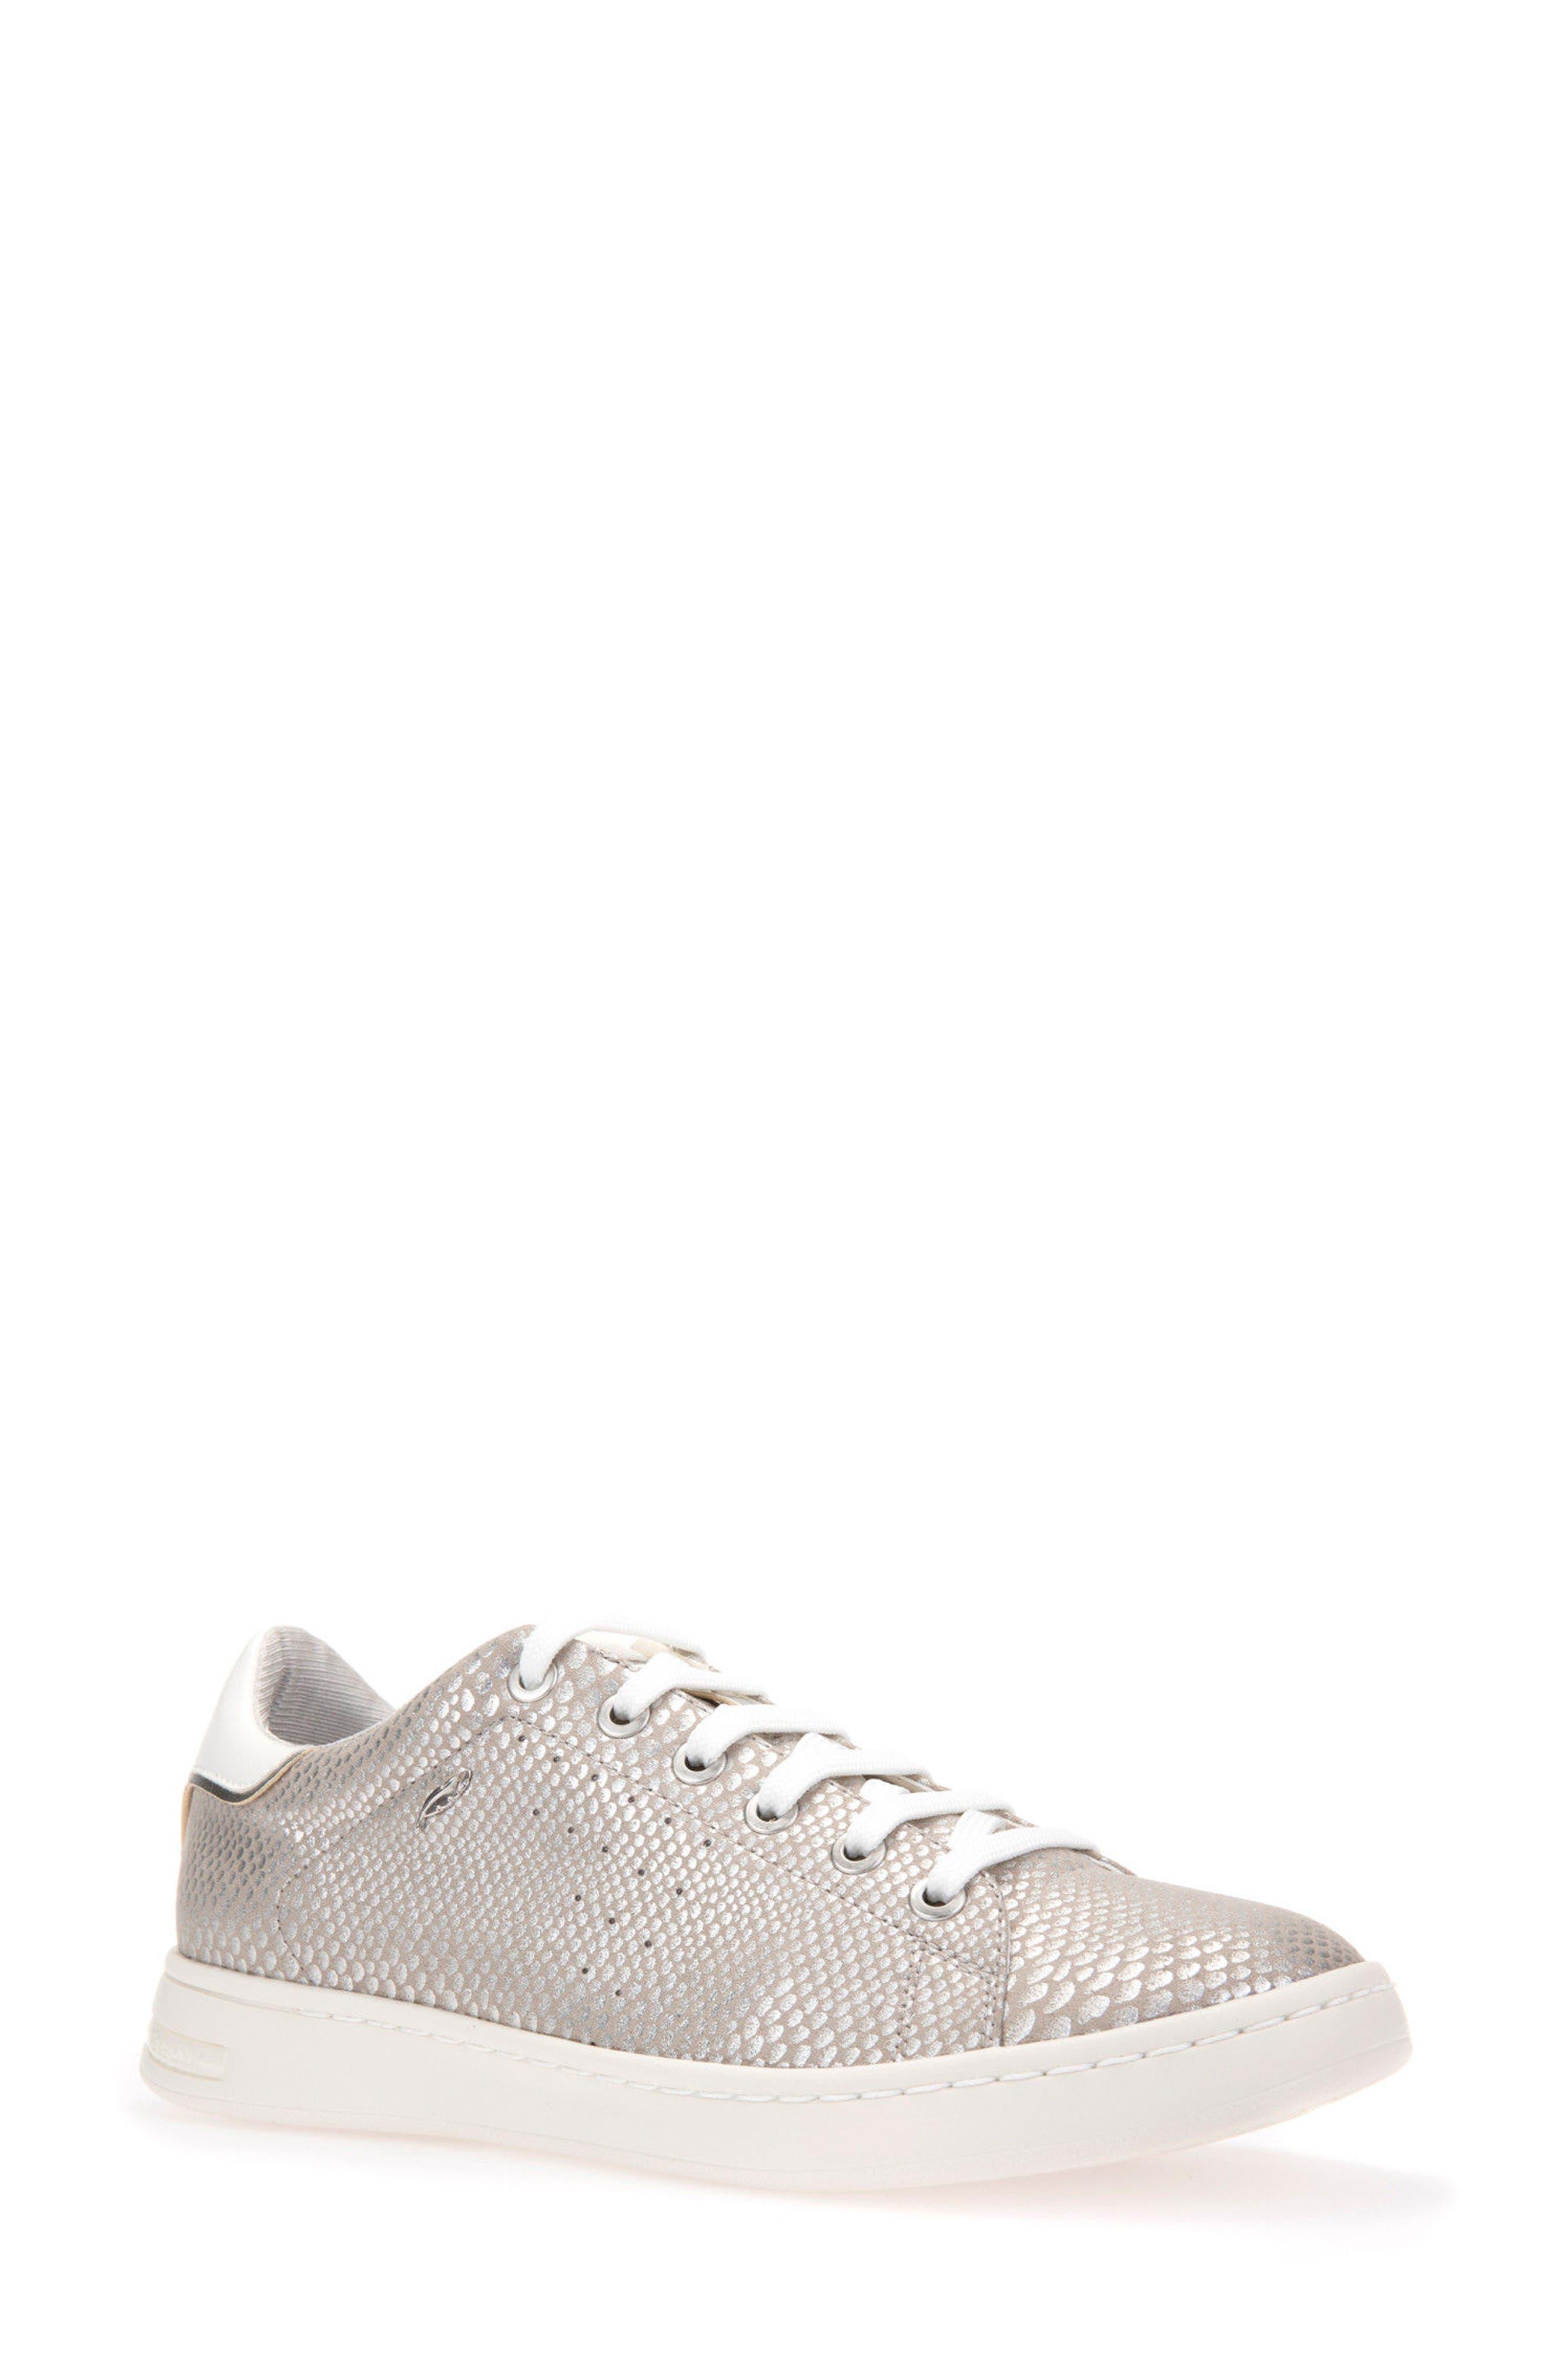 Jaysen Sneaker,                         Main,                         color, 040